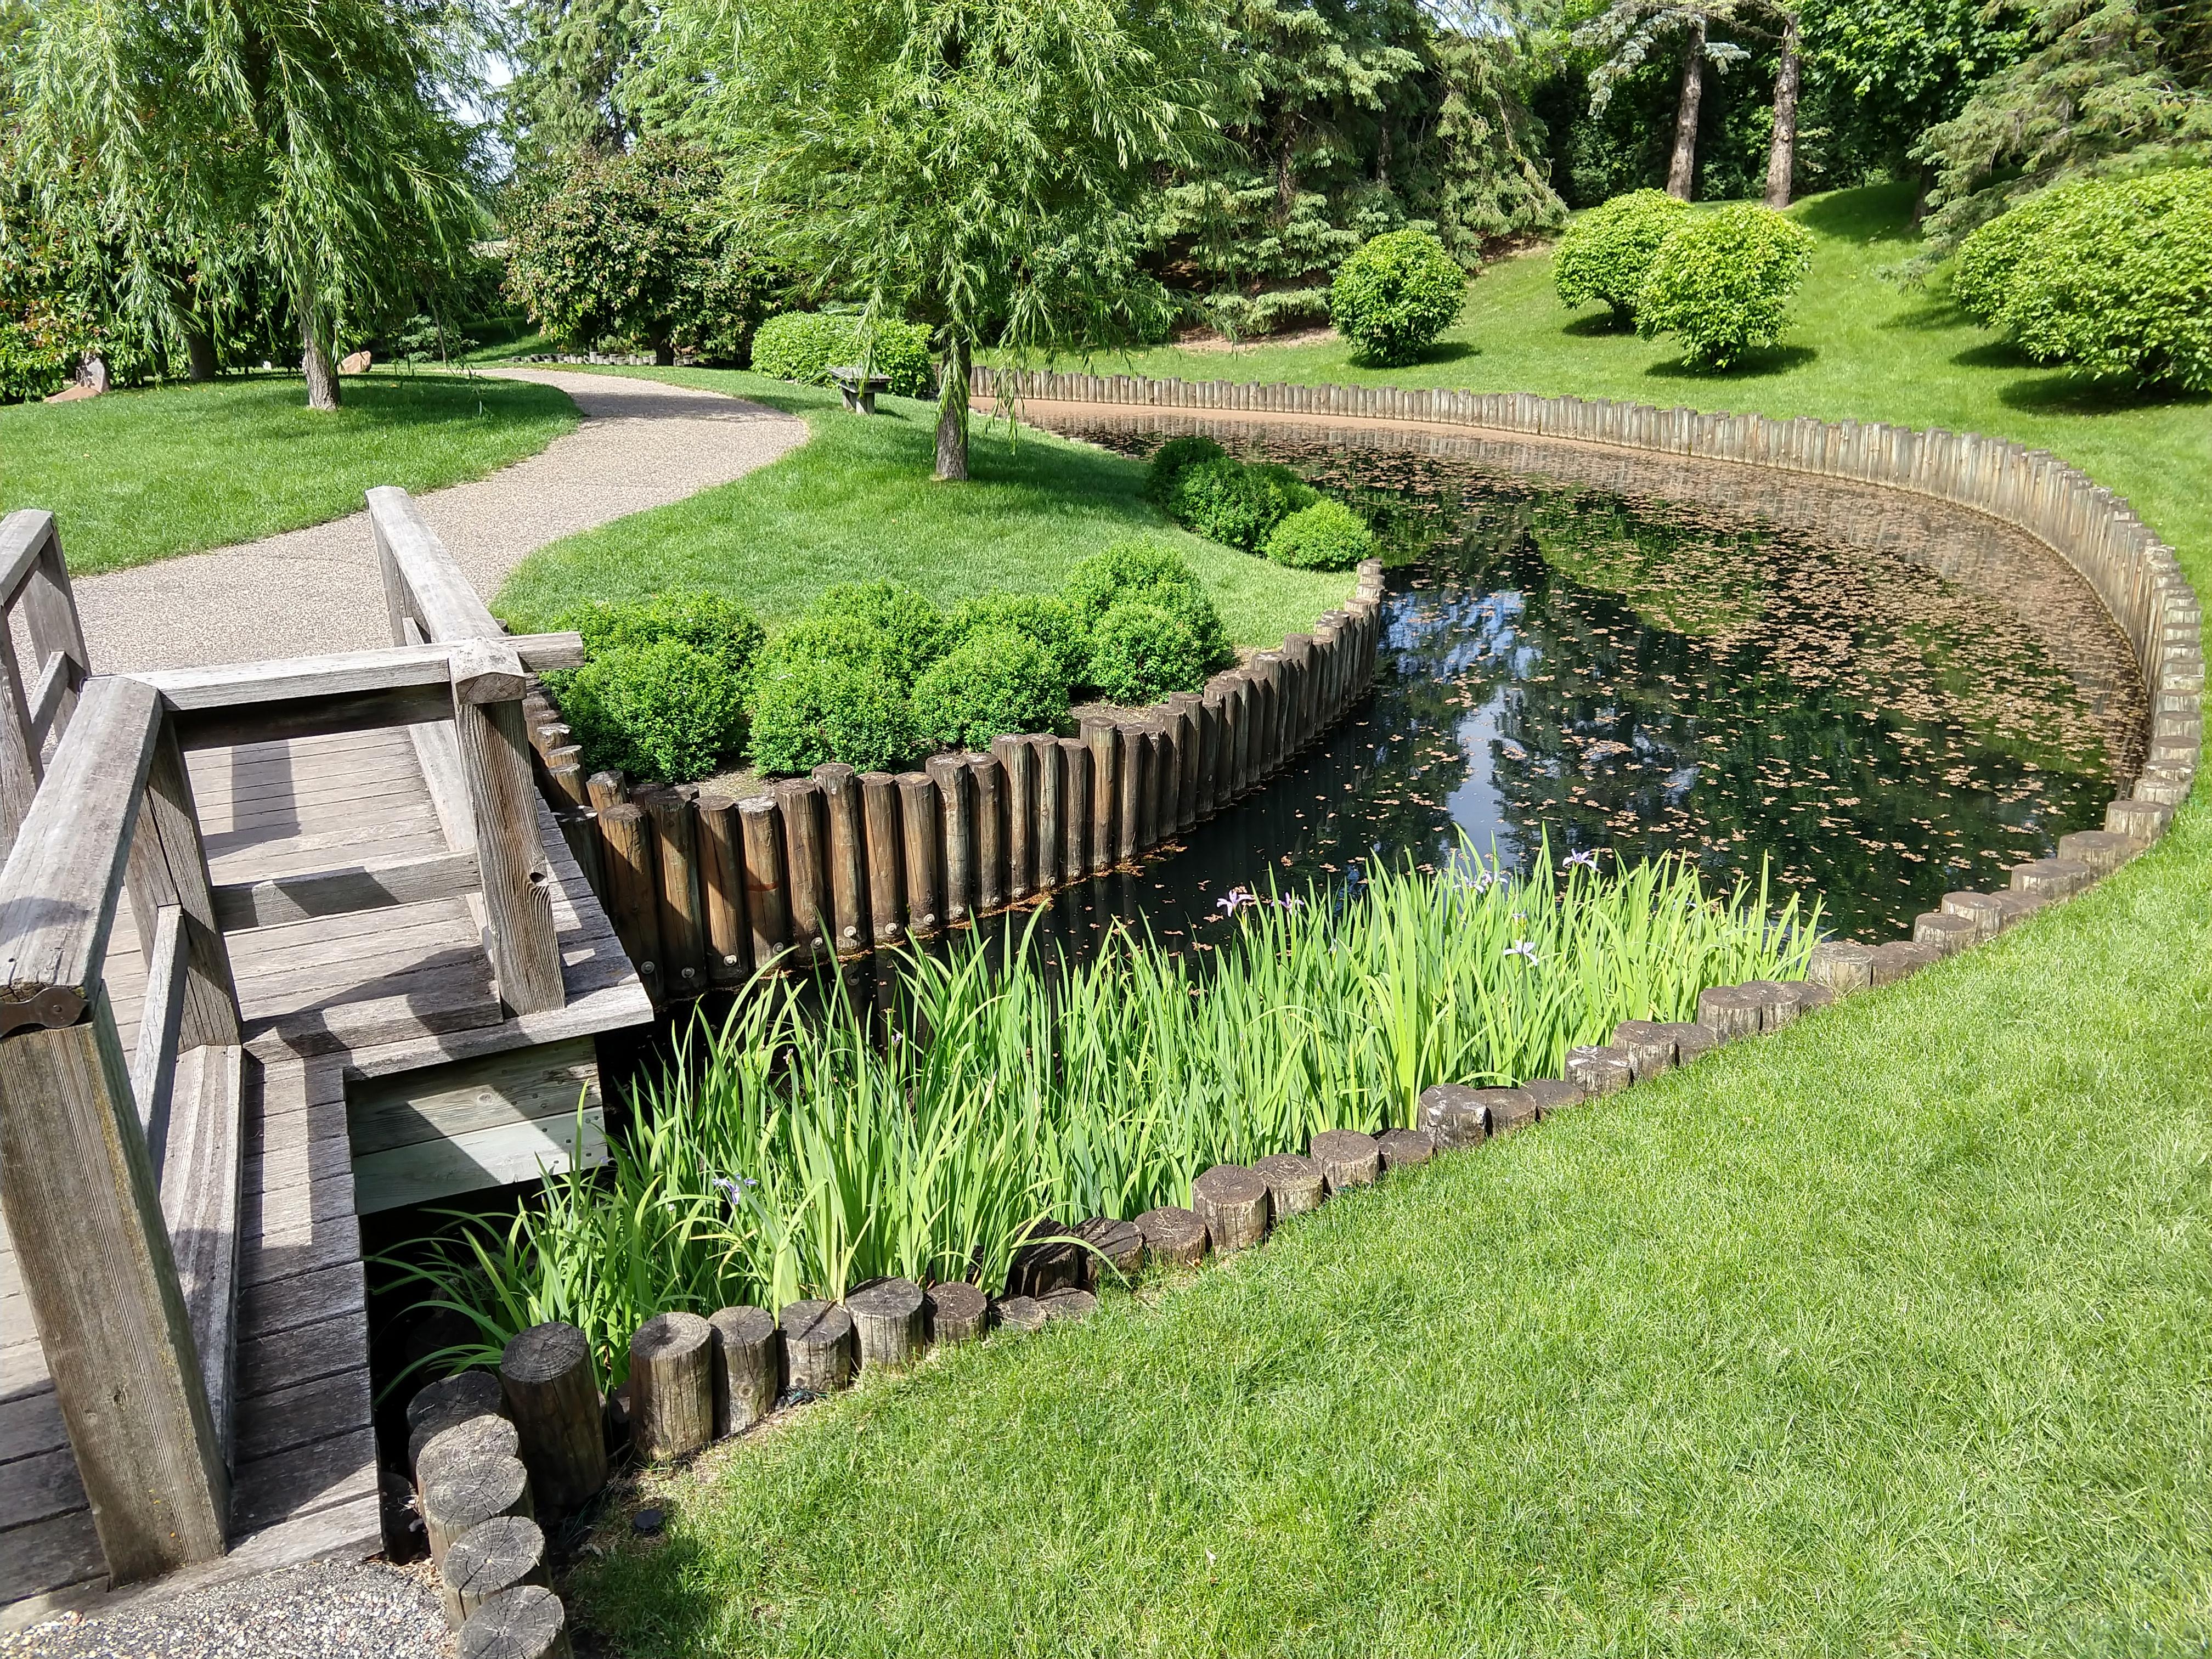 File:Normandale Community College 06 - Japanese garden.jpg